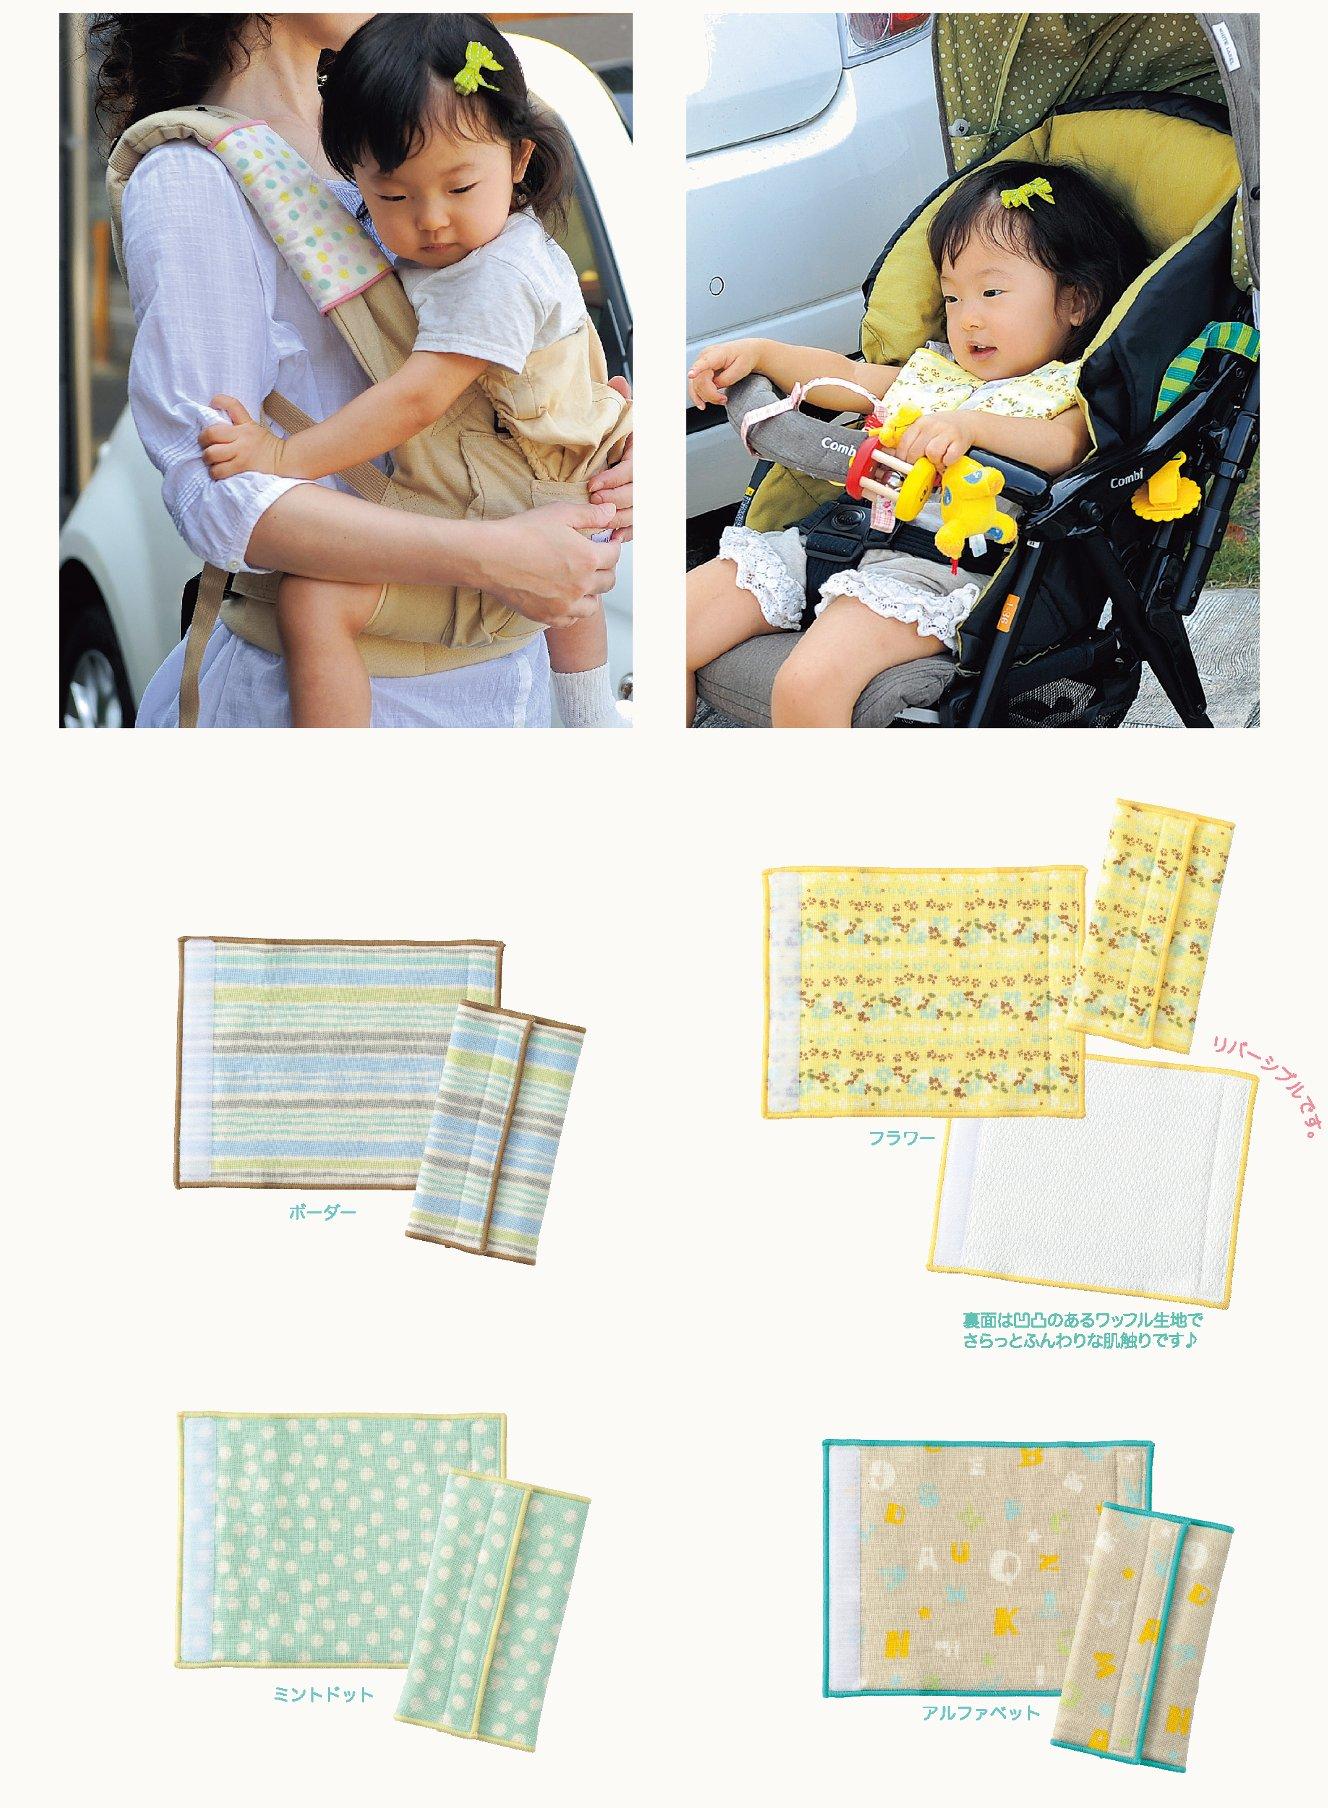 Maruwa trade [Dakkohimoya sheet drool cover for the belt] Pojito belt cover 2 Disc Flower